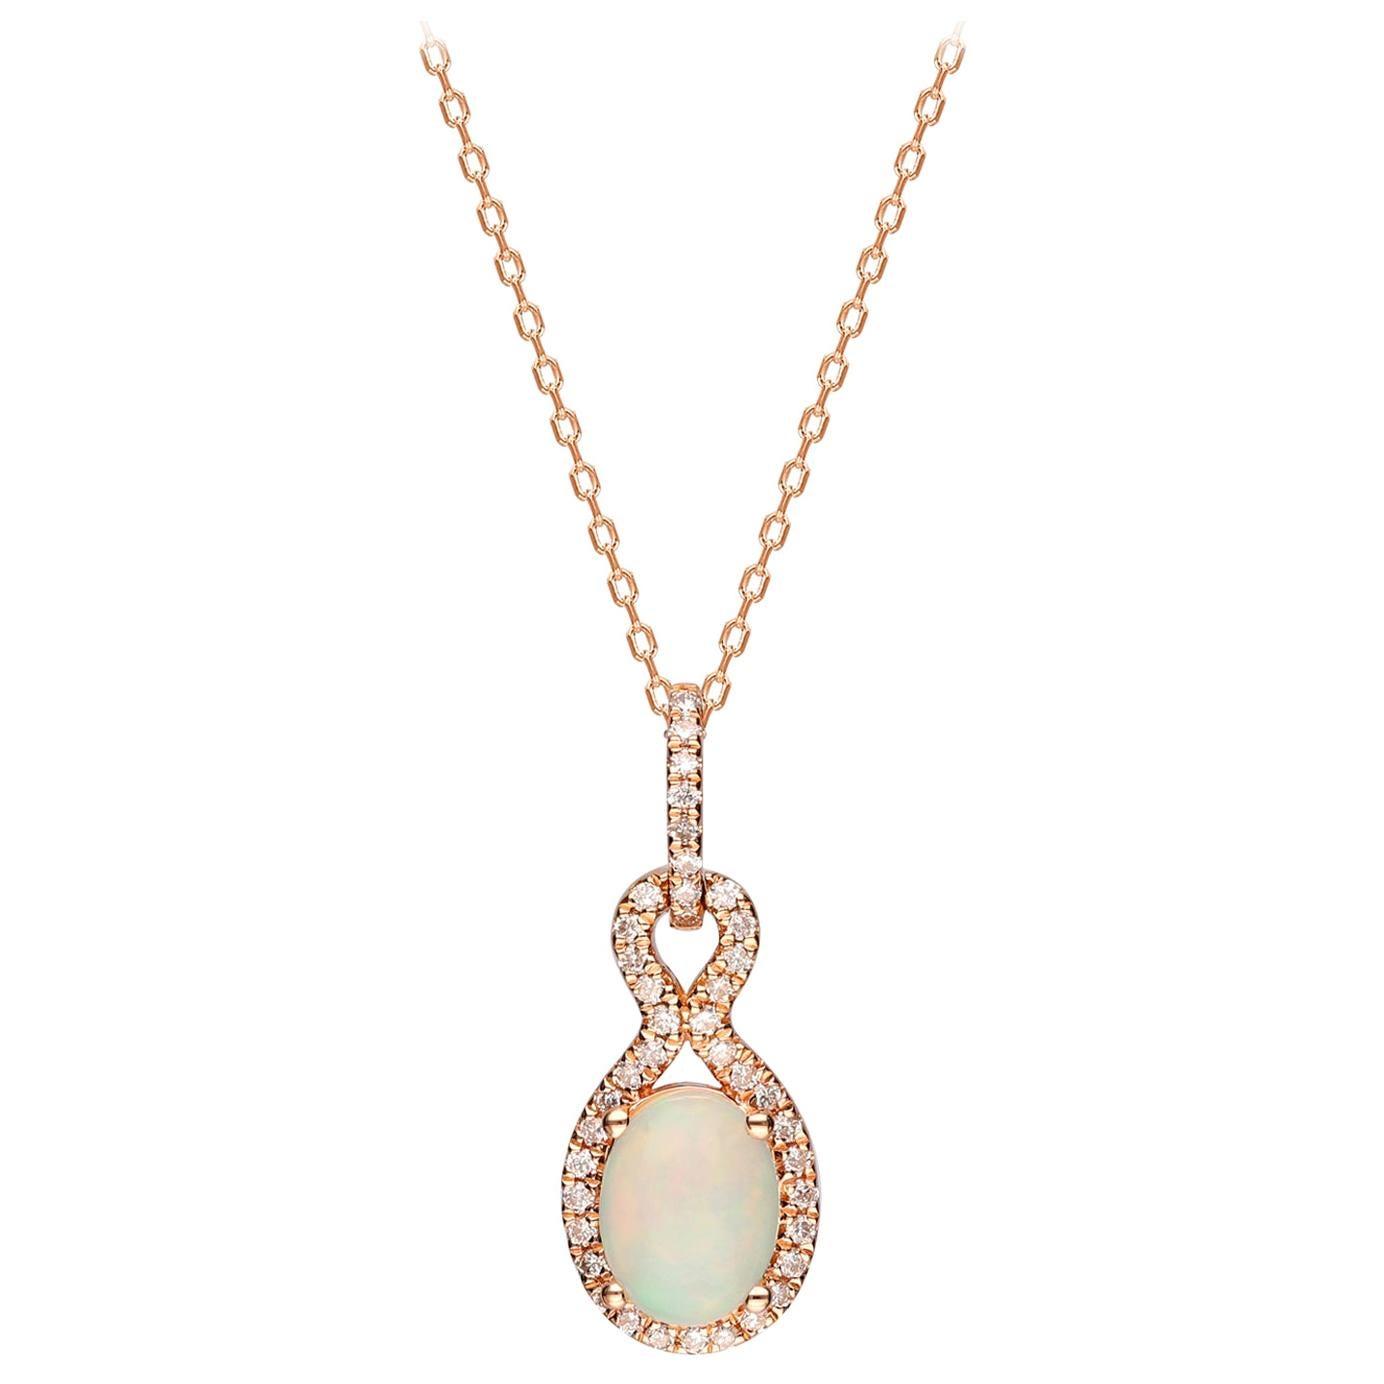 0.80 Carat Ethiopian Opal and Diamond 14 Karat Rose Gold Pendant